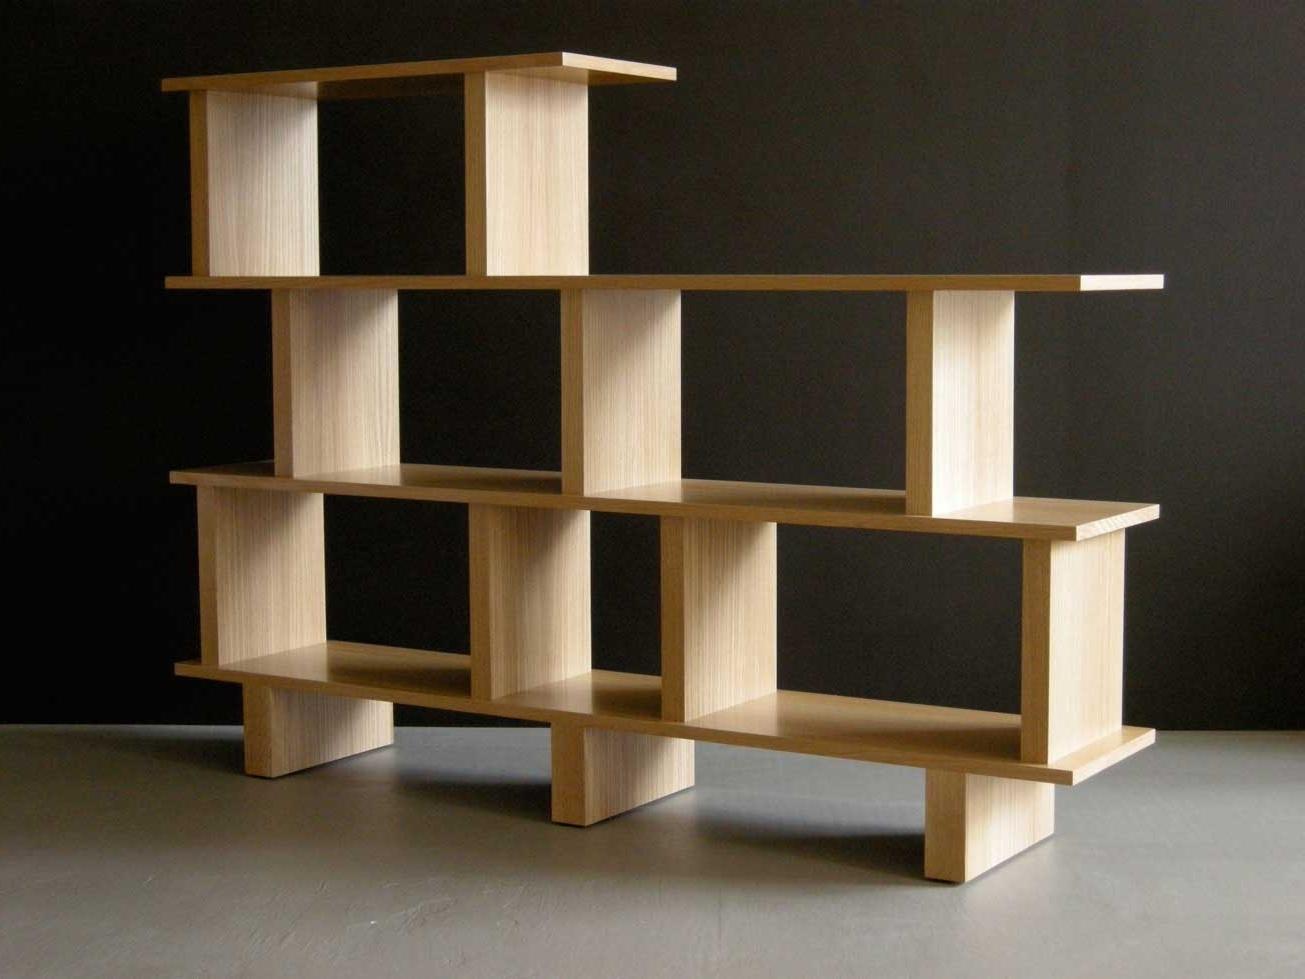 Free Standing Book Shelf Pertaining To Preferred Baffling Design Home Bookshelf Ideas. Decorating (View 11 of 15)